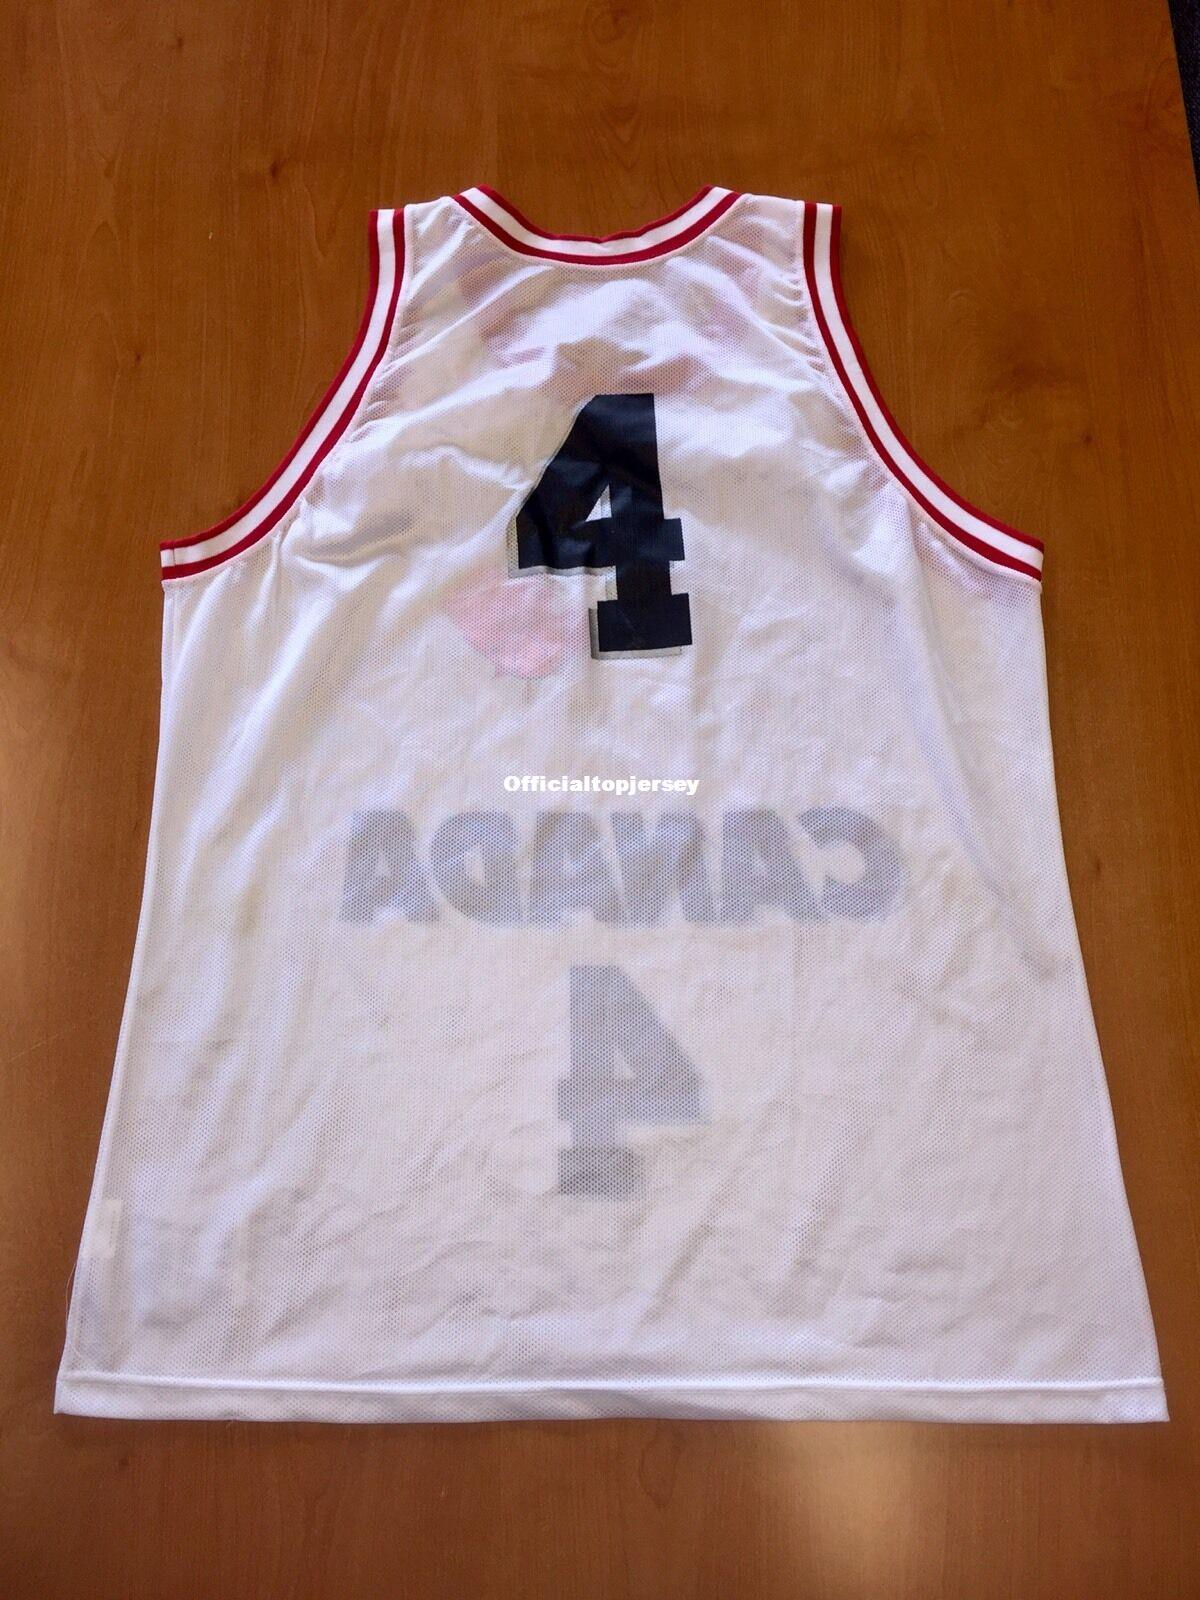 Cheap Vintage 1994 Rick Fox #4 Canada Champion Jersey fiba nash Men XS-5XL.6XL shirt stitched basketball jerseys Retro NCAA